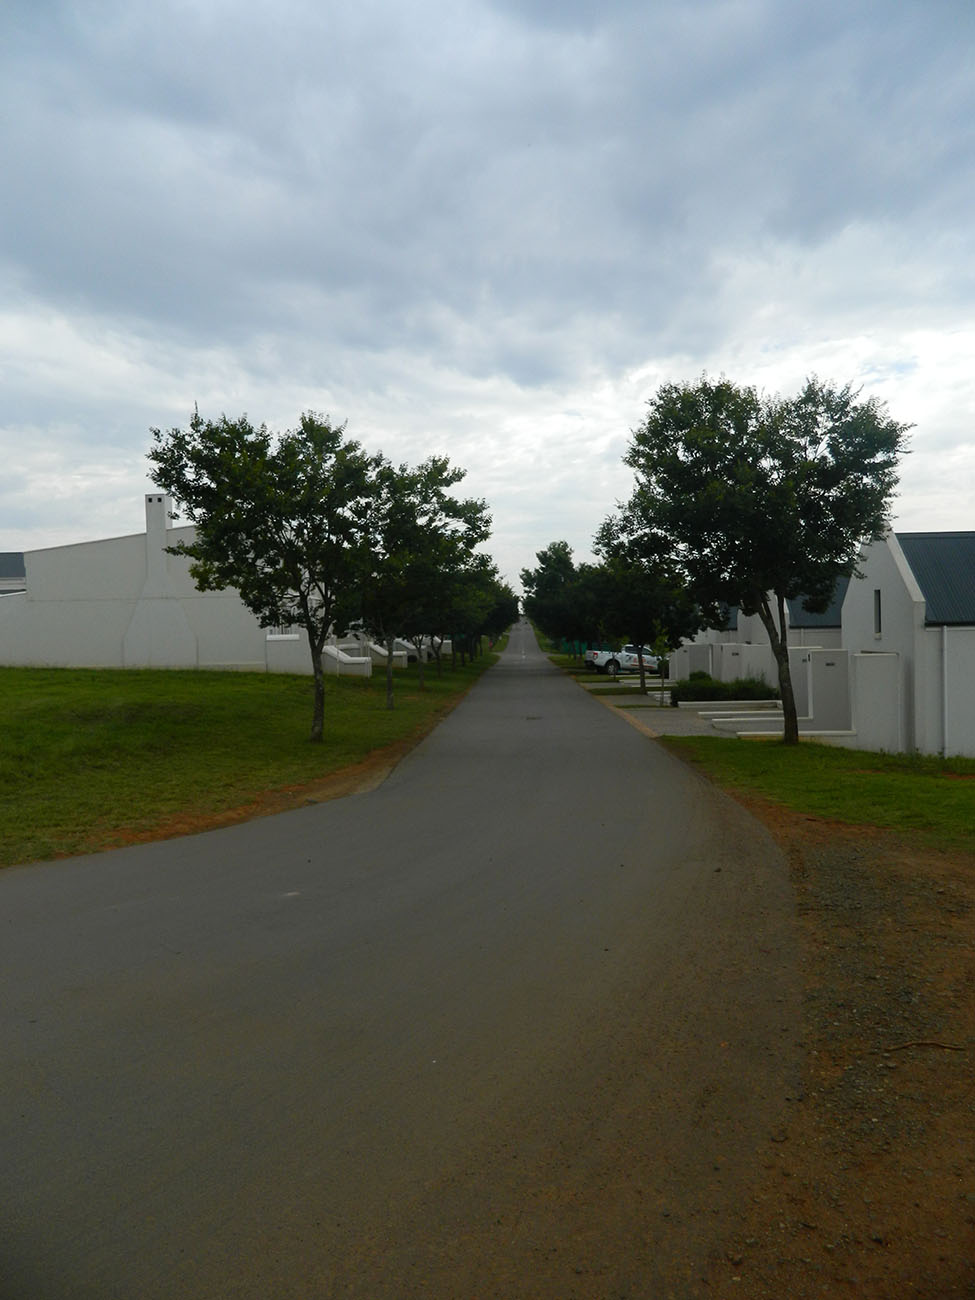 friendly-town-house-for-let-housing-farm-garlington-estate